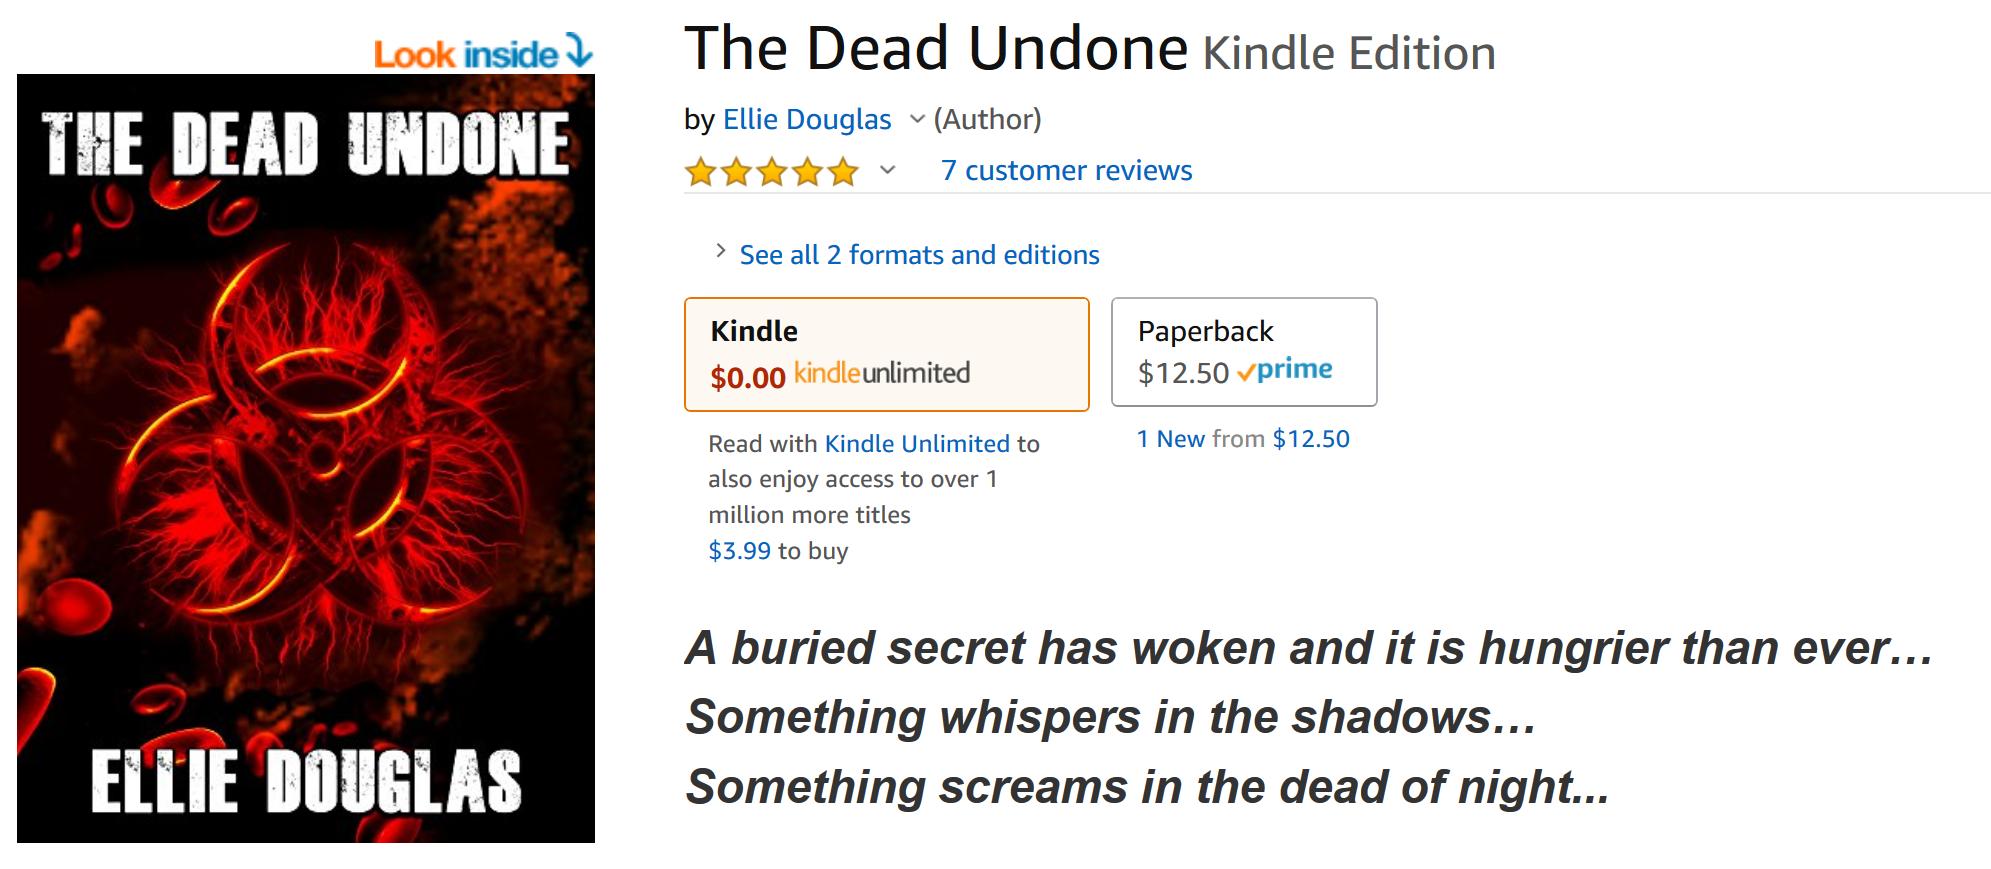 Travis Borne's book review of The Dead Undone by Ellie Douglas